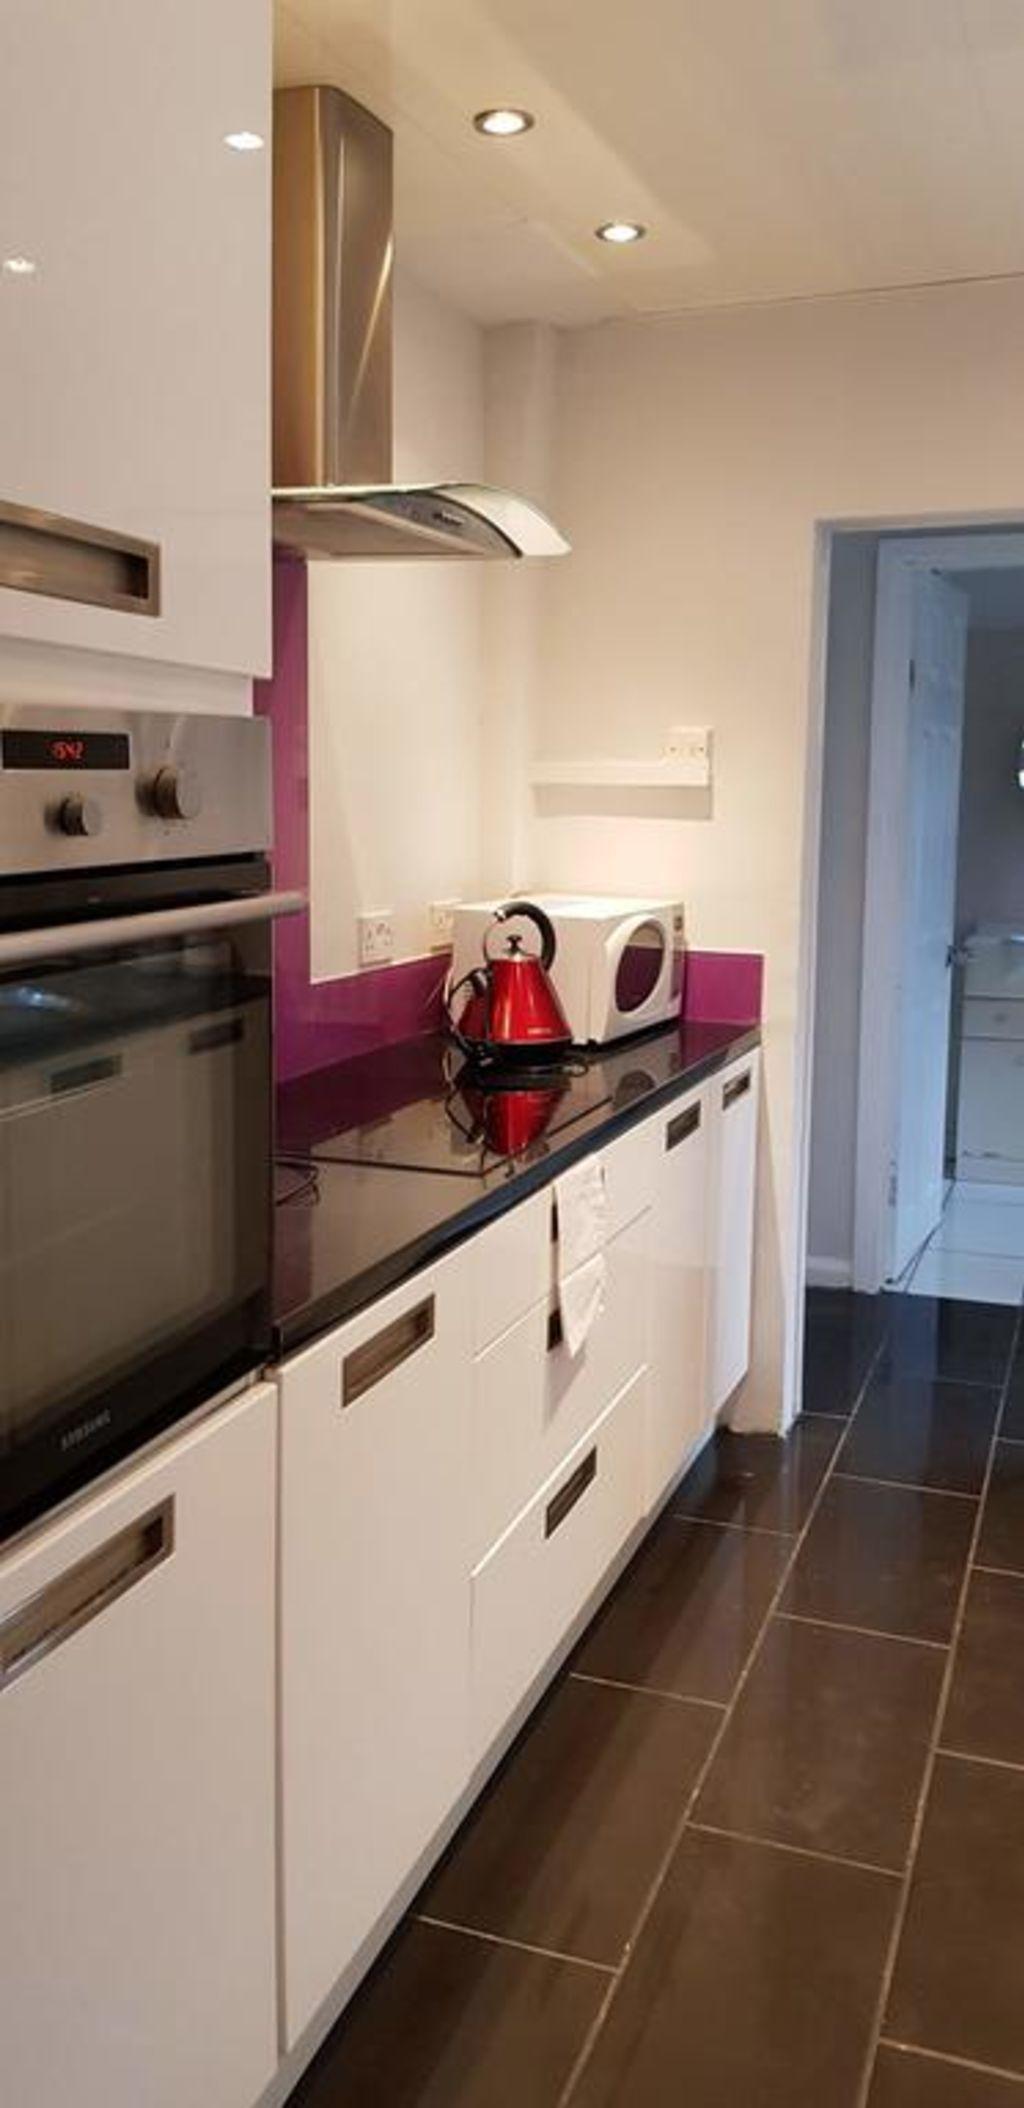 image 3 furnished 3 bedroom Apartment for rent in Gedling, Nottinghamshire